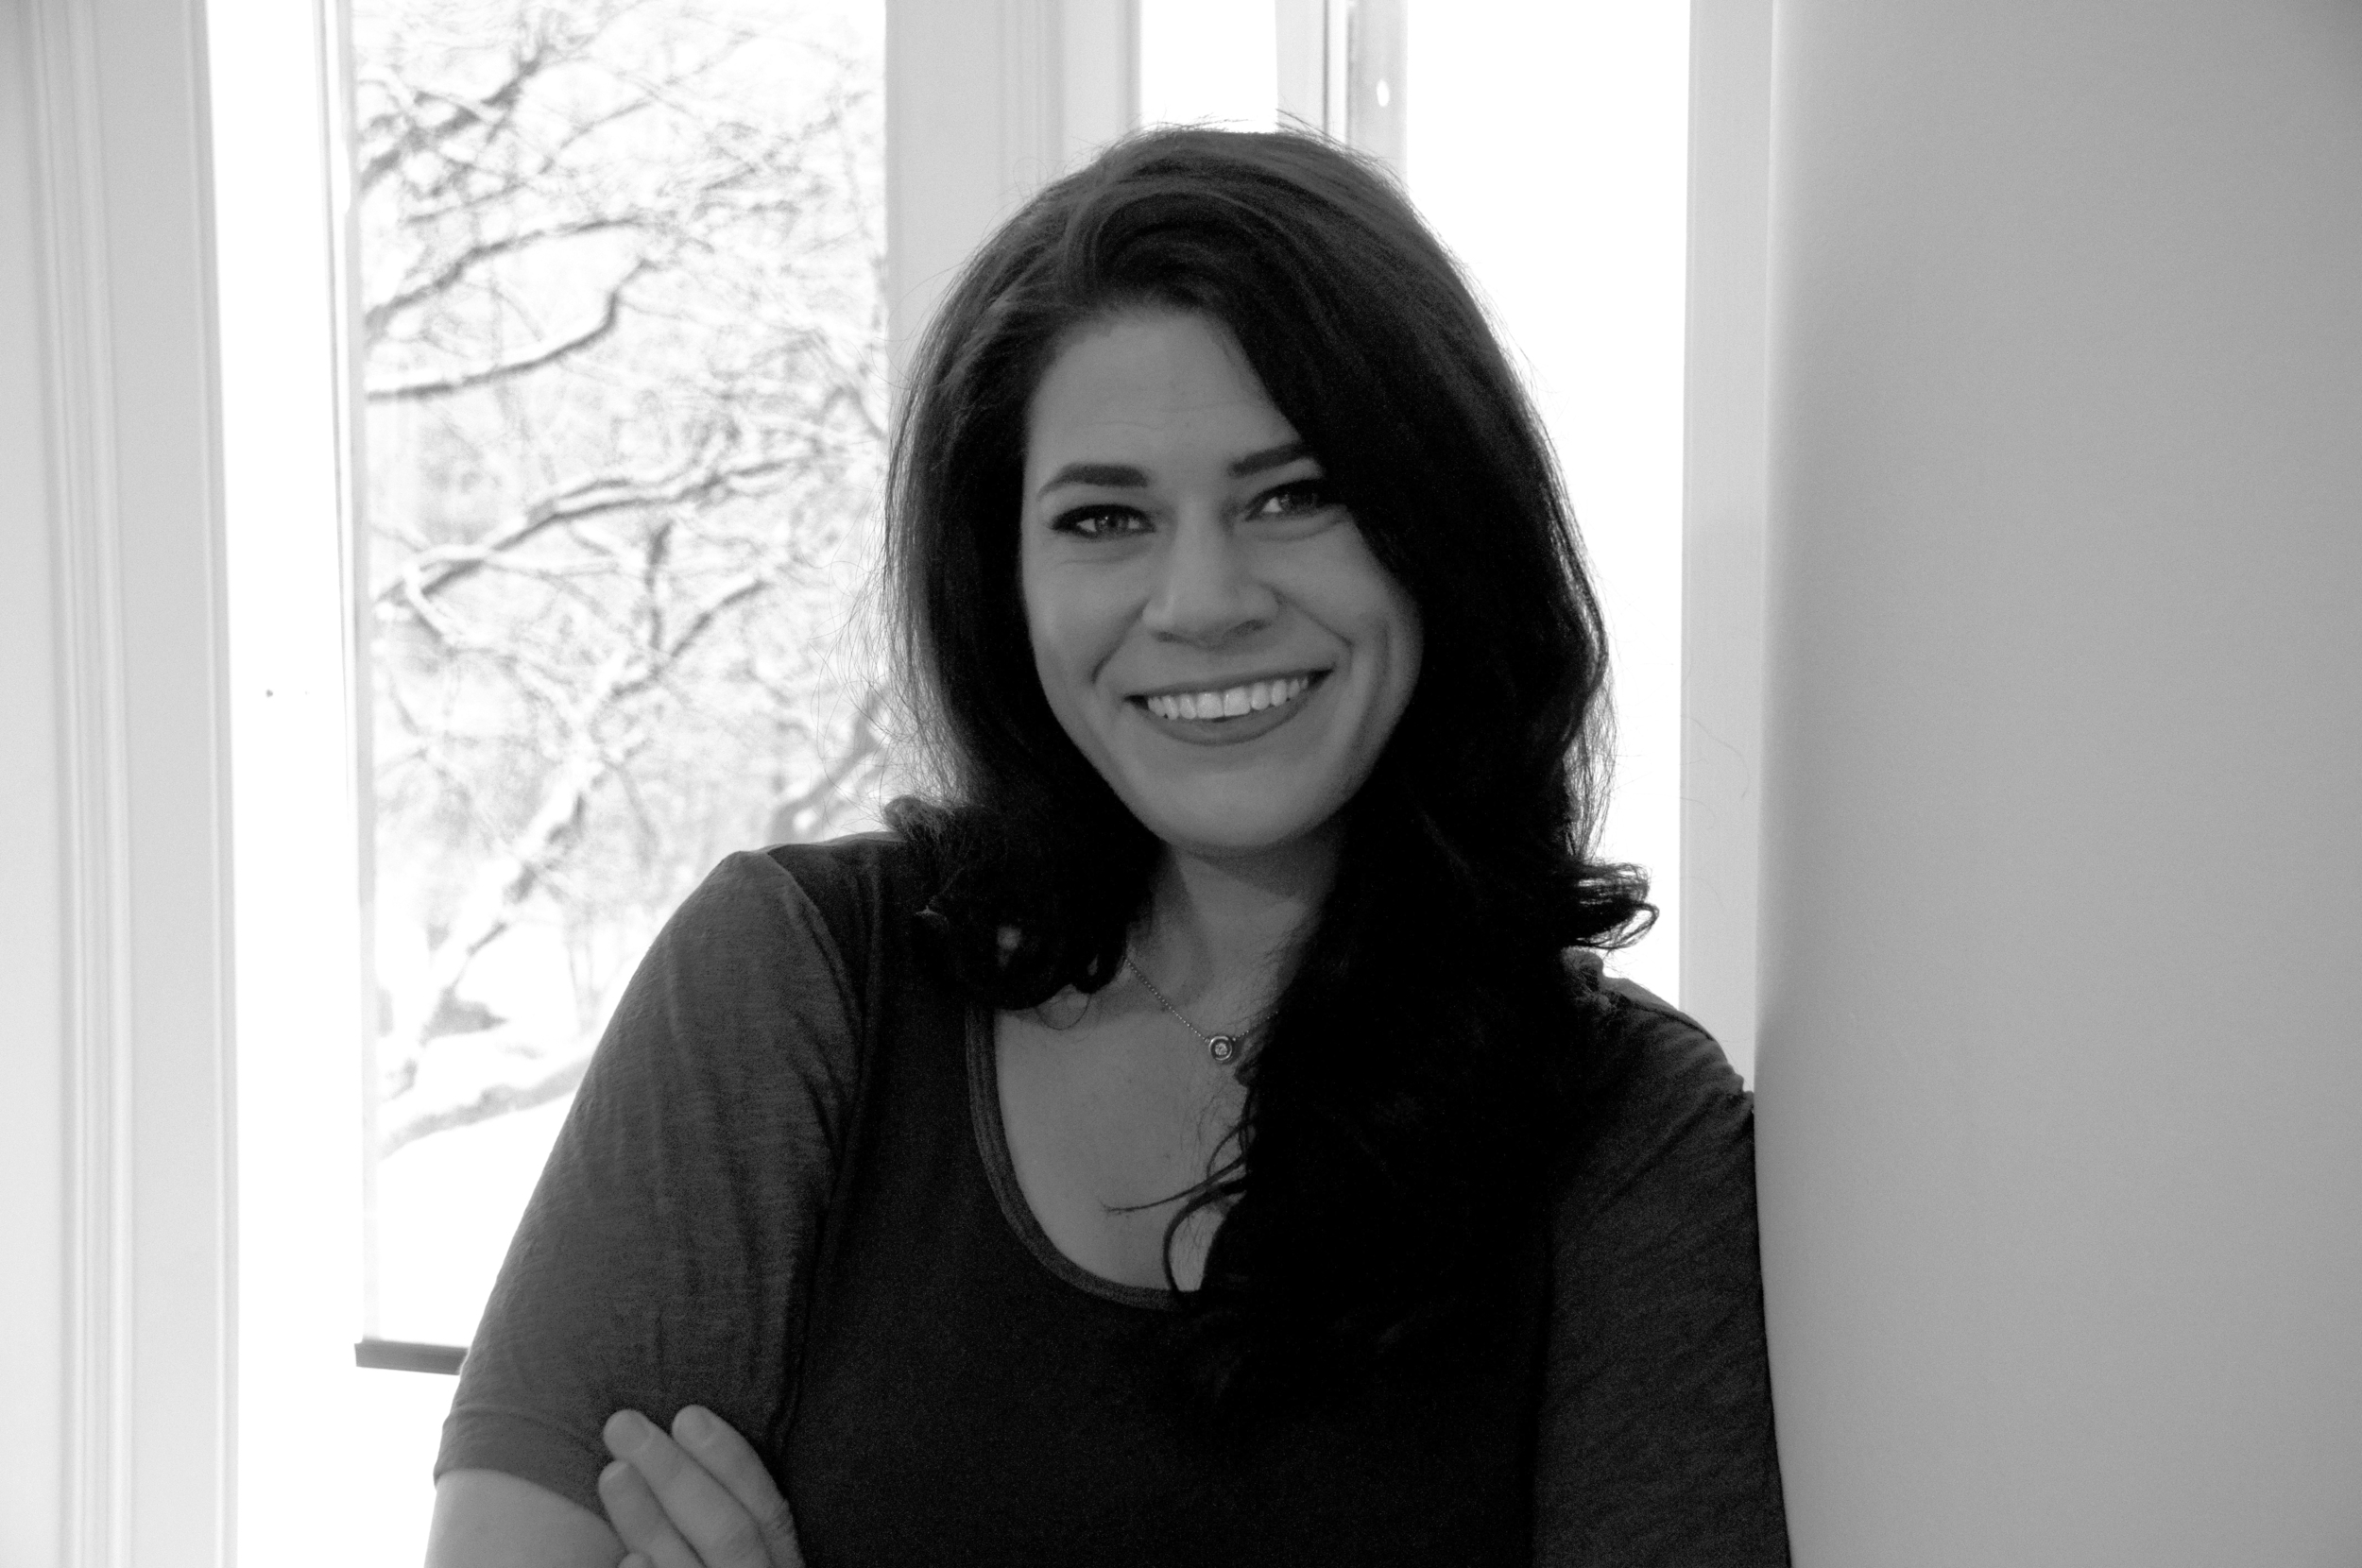 Tricia O'Malley, Author